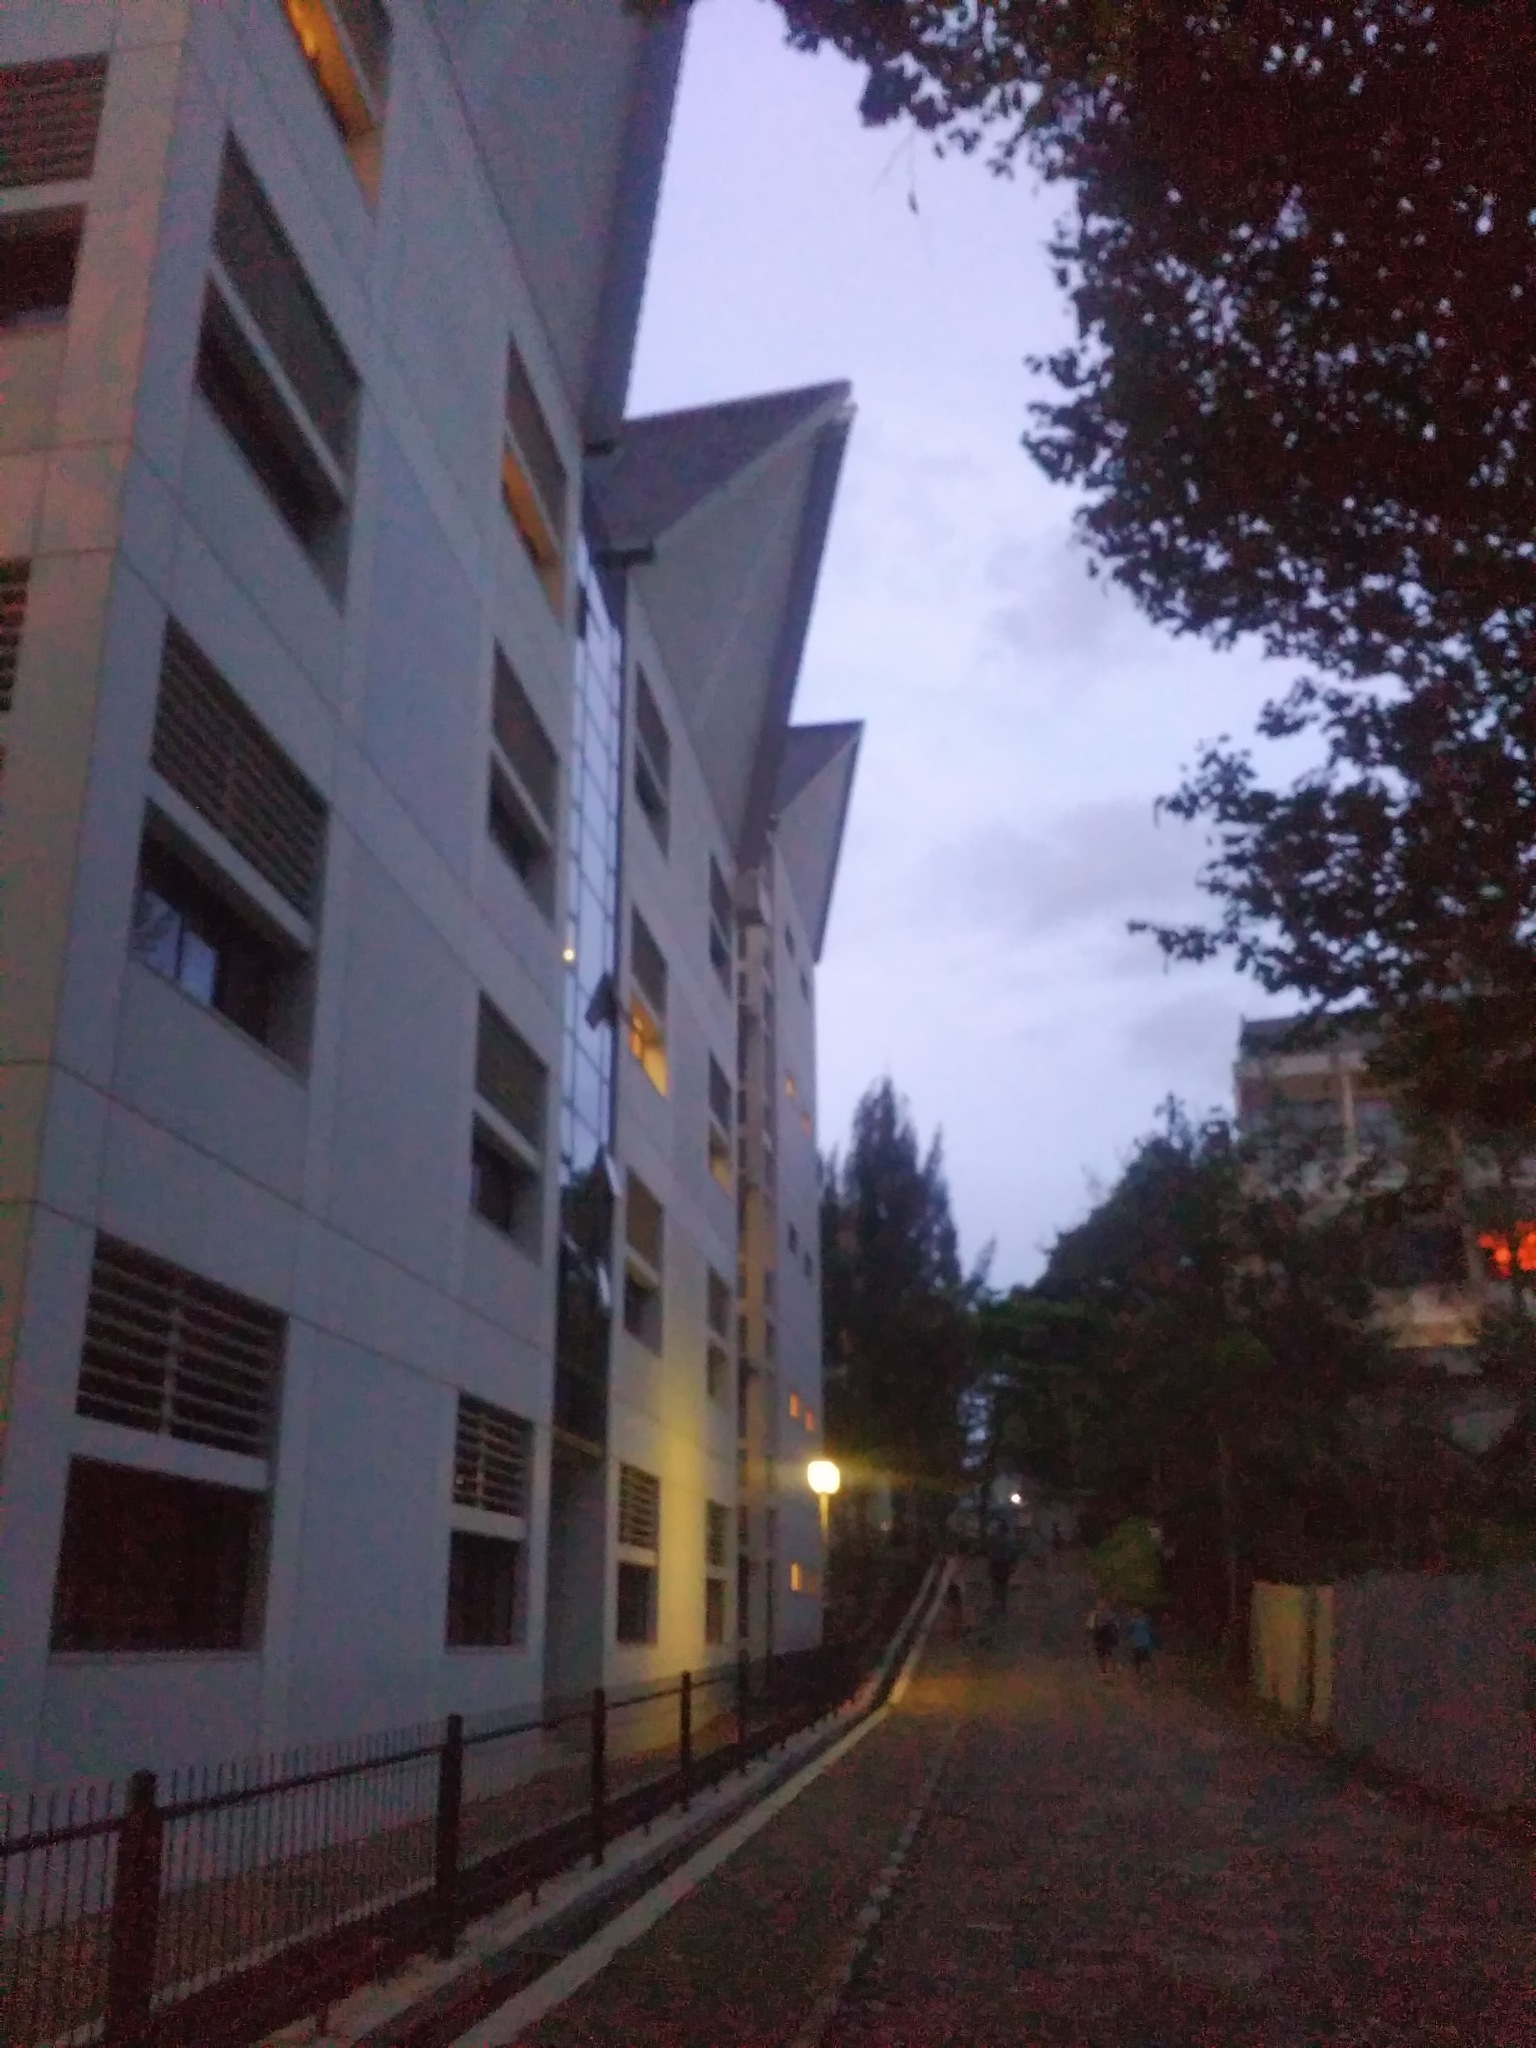 College in Japan by selinurpianti